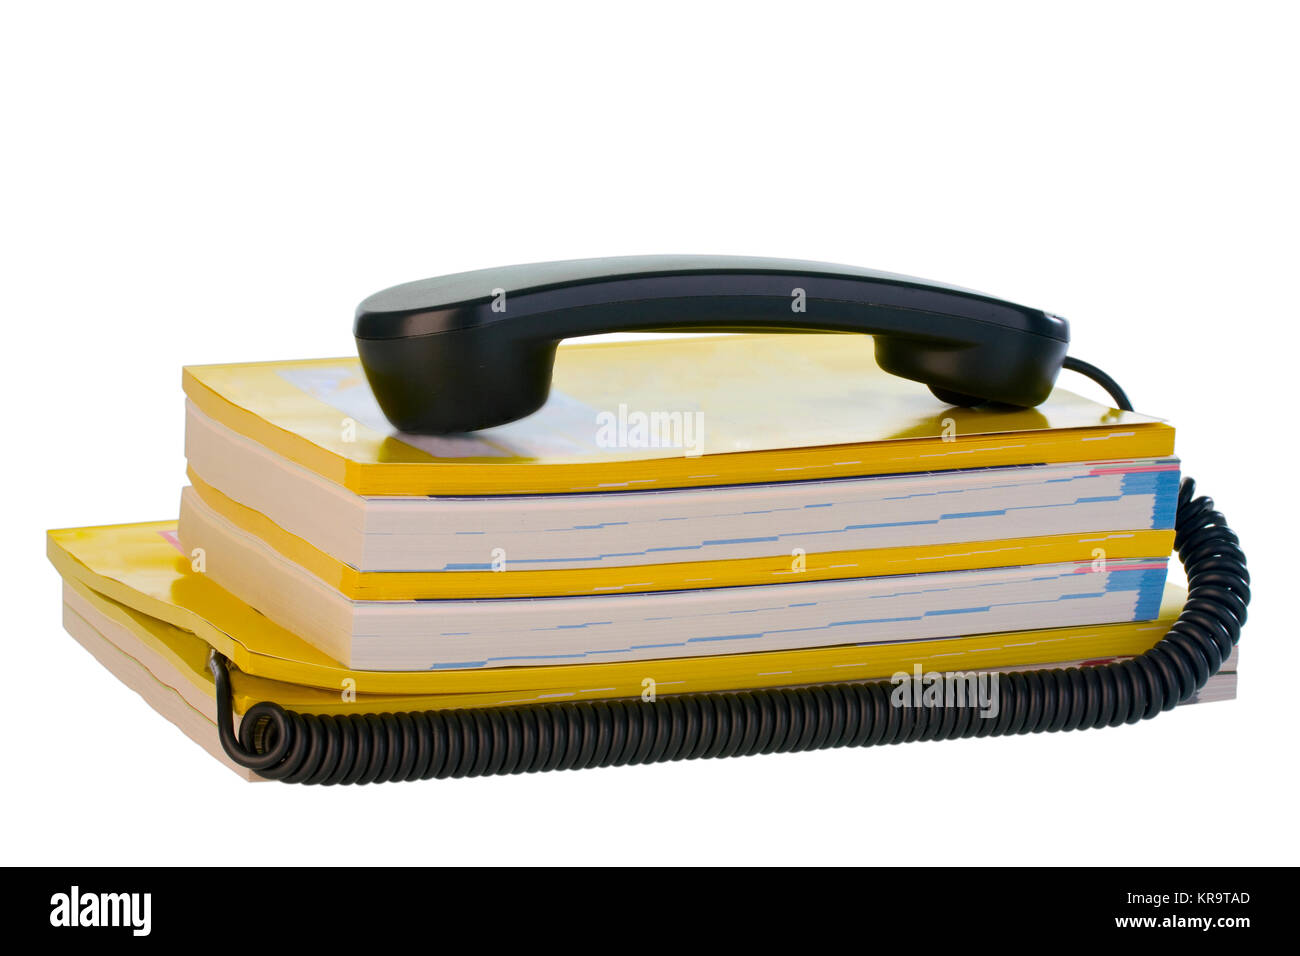 telefonhoerer with phonebook - Stock Image